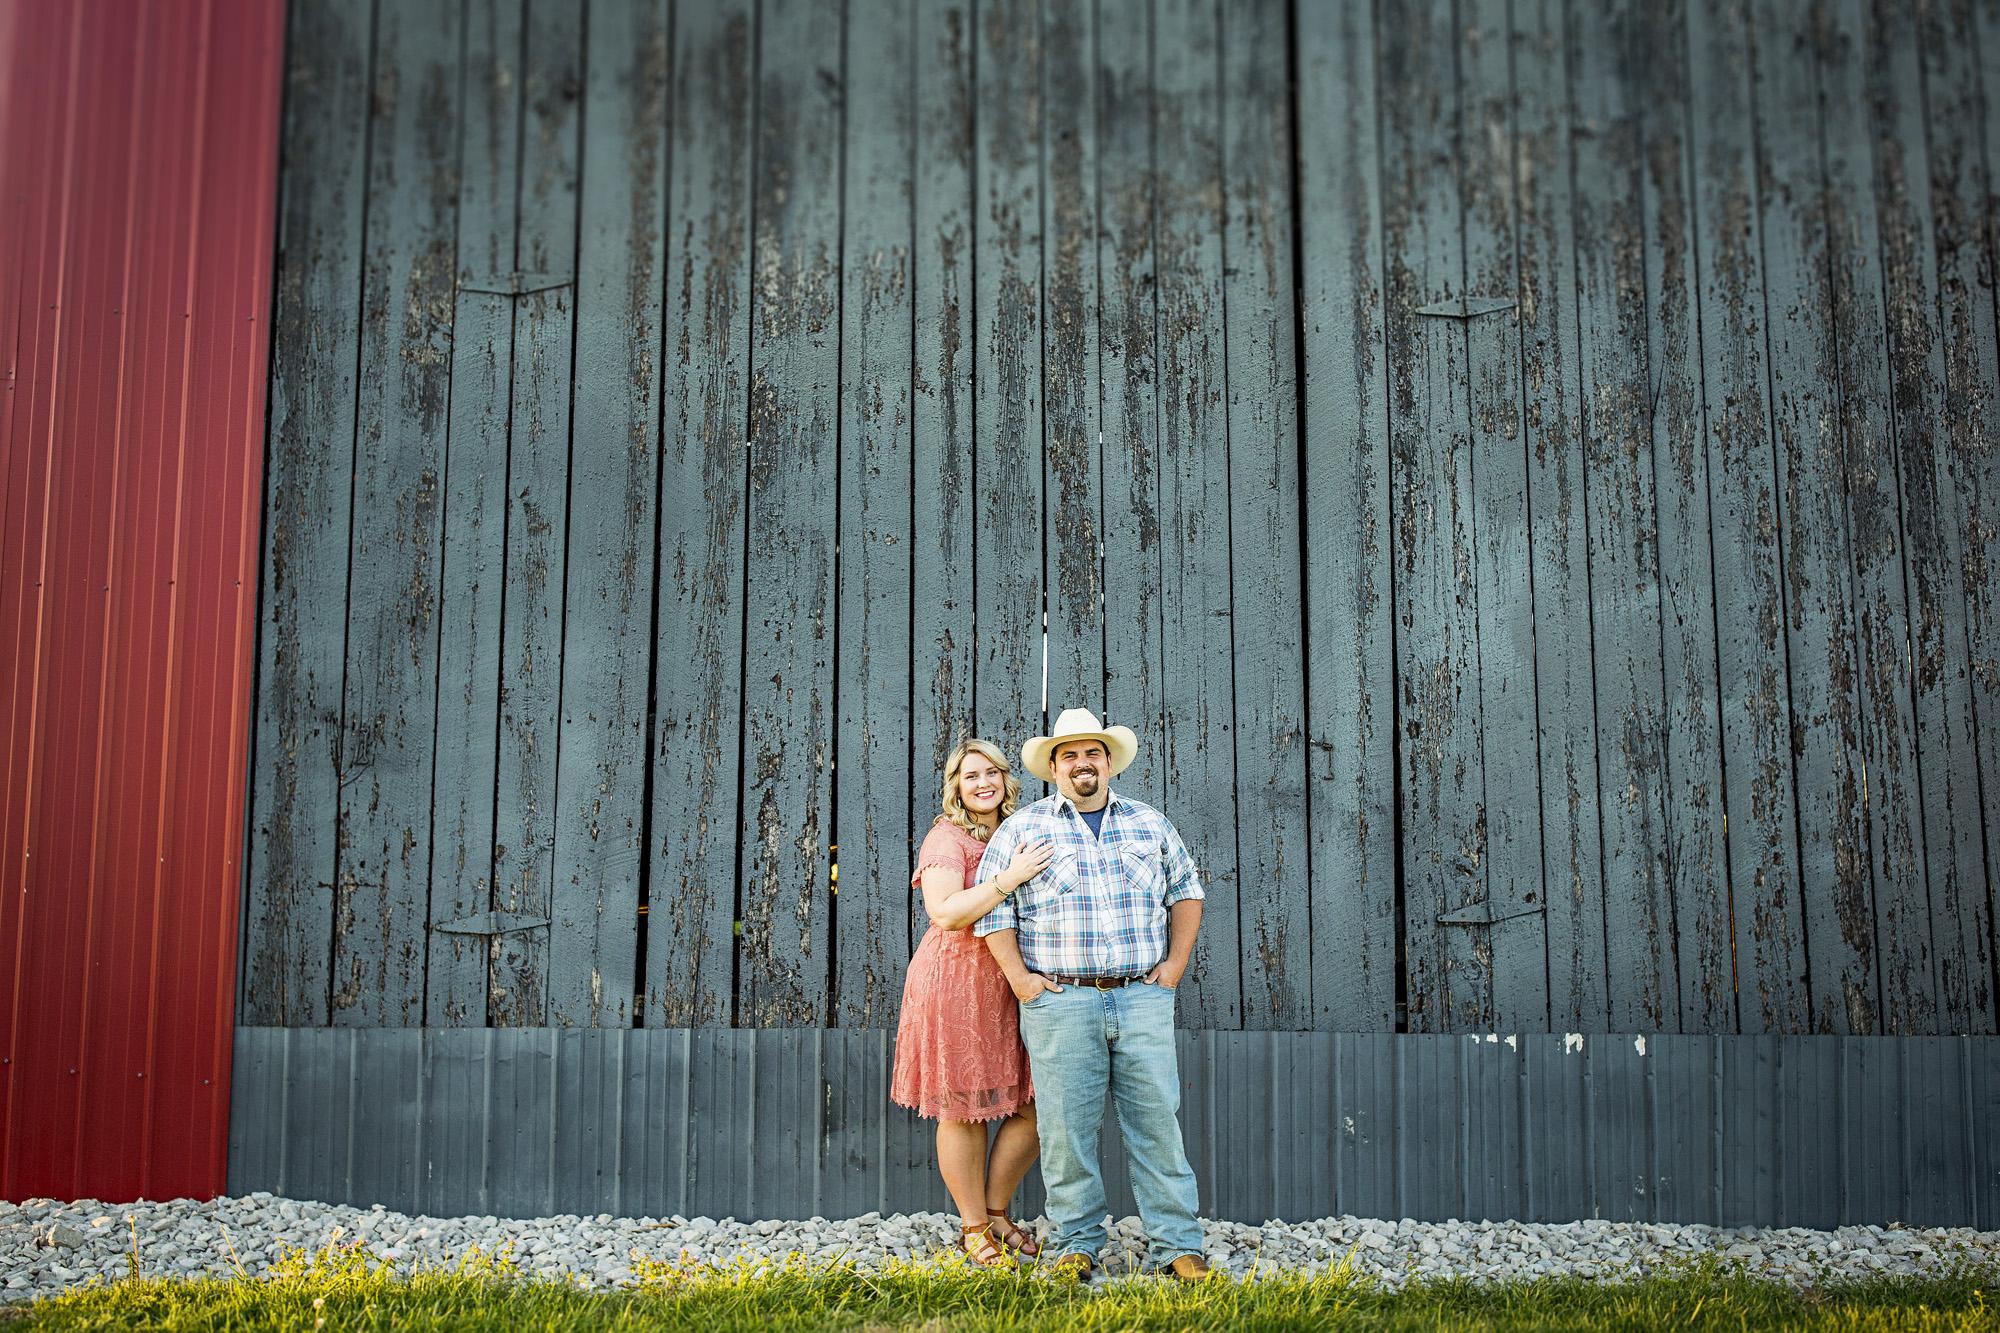 Seriously_Sabrina_Photography_Lexington_Kentucky_Sunset_Farm_Engagement_Cody_Sara_25.jpg